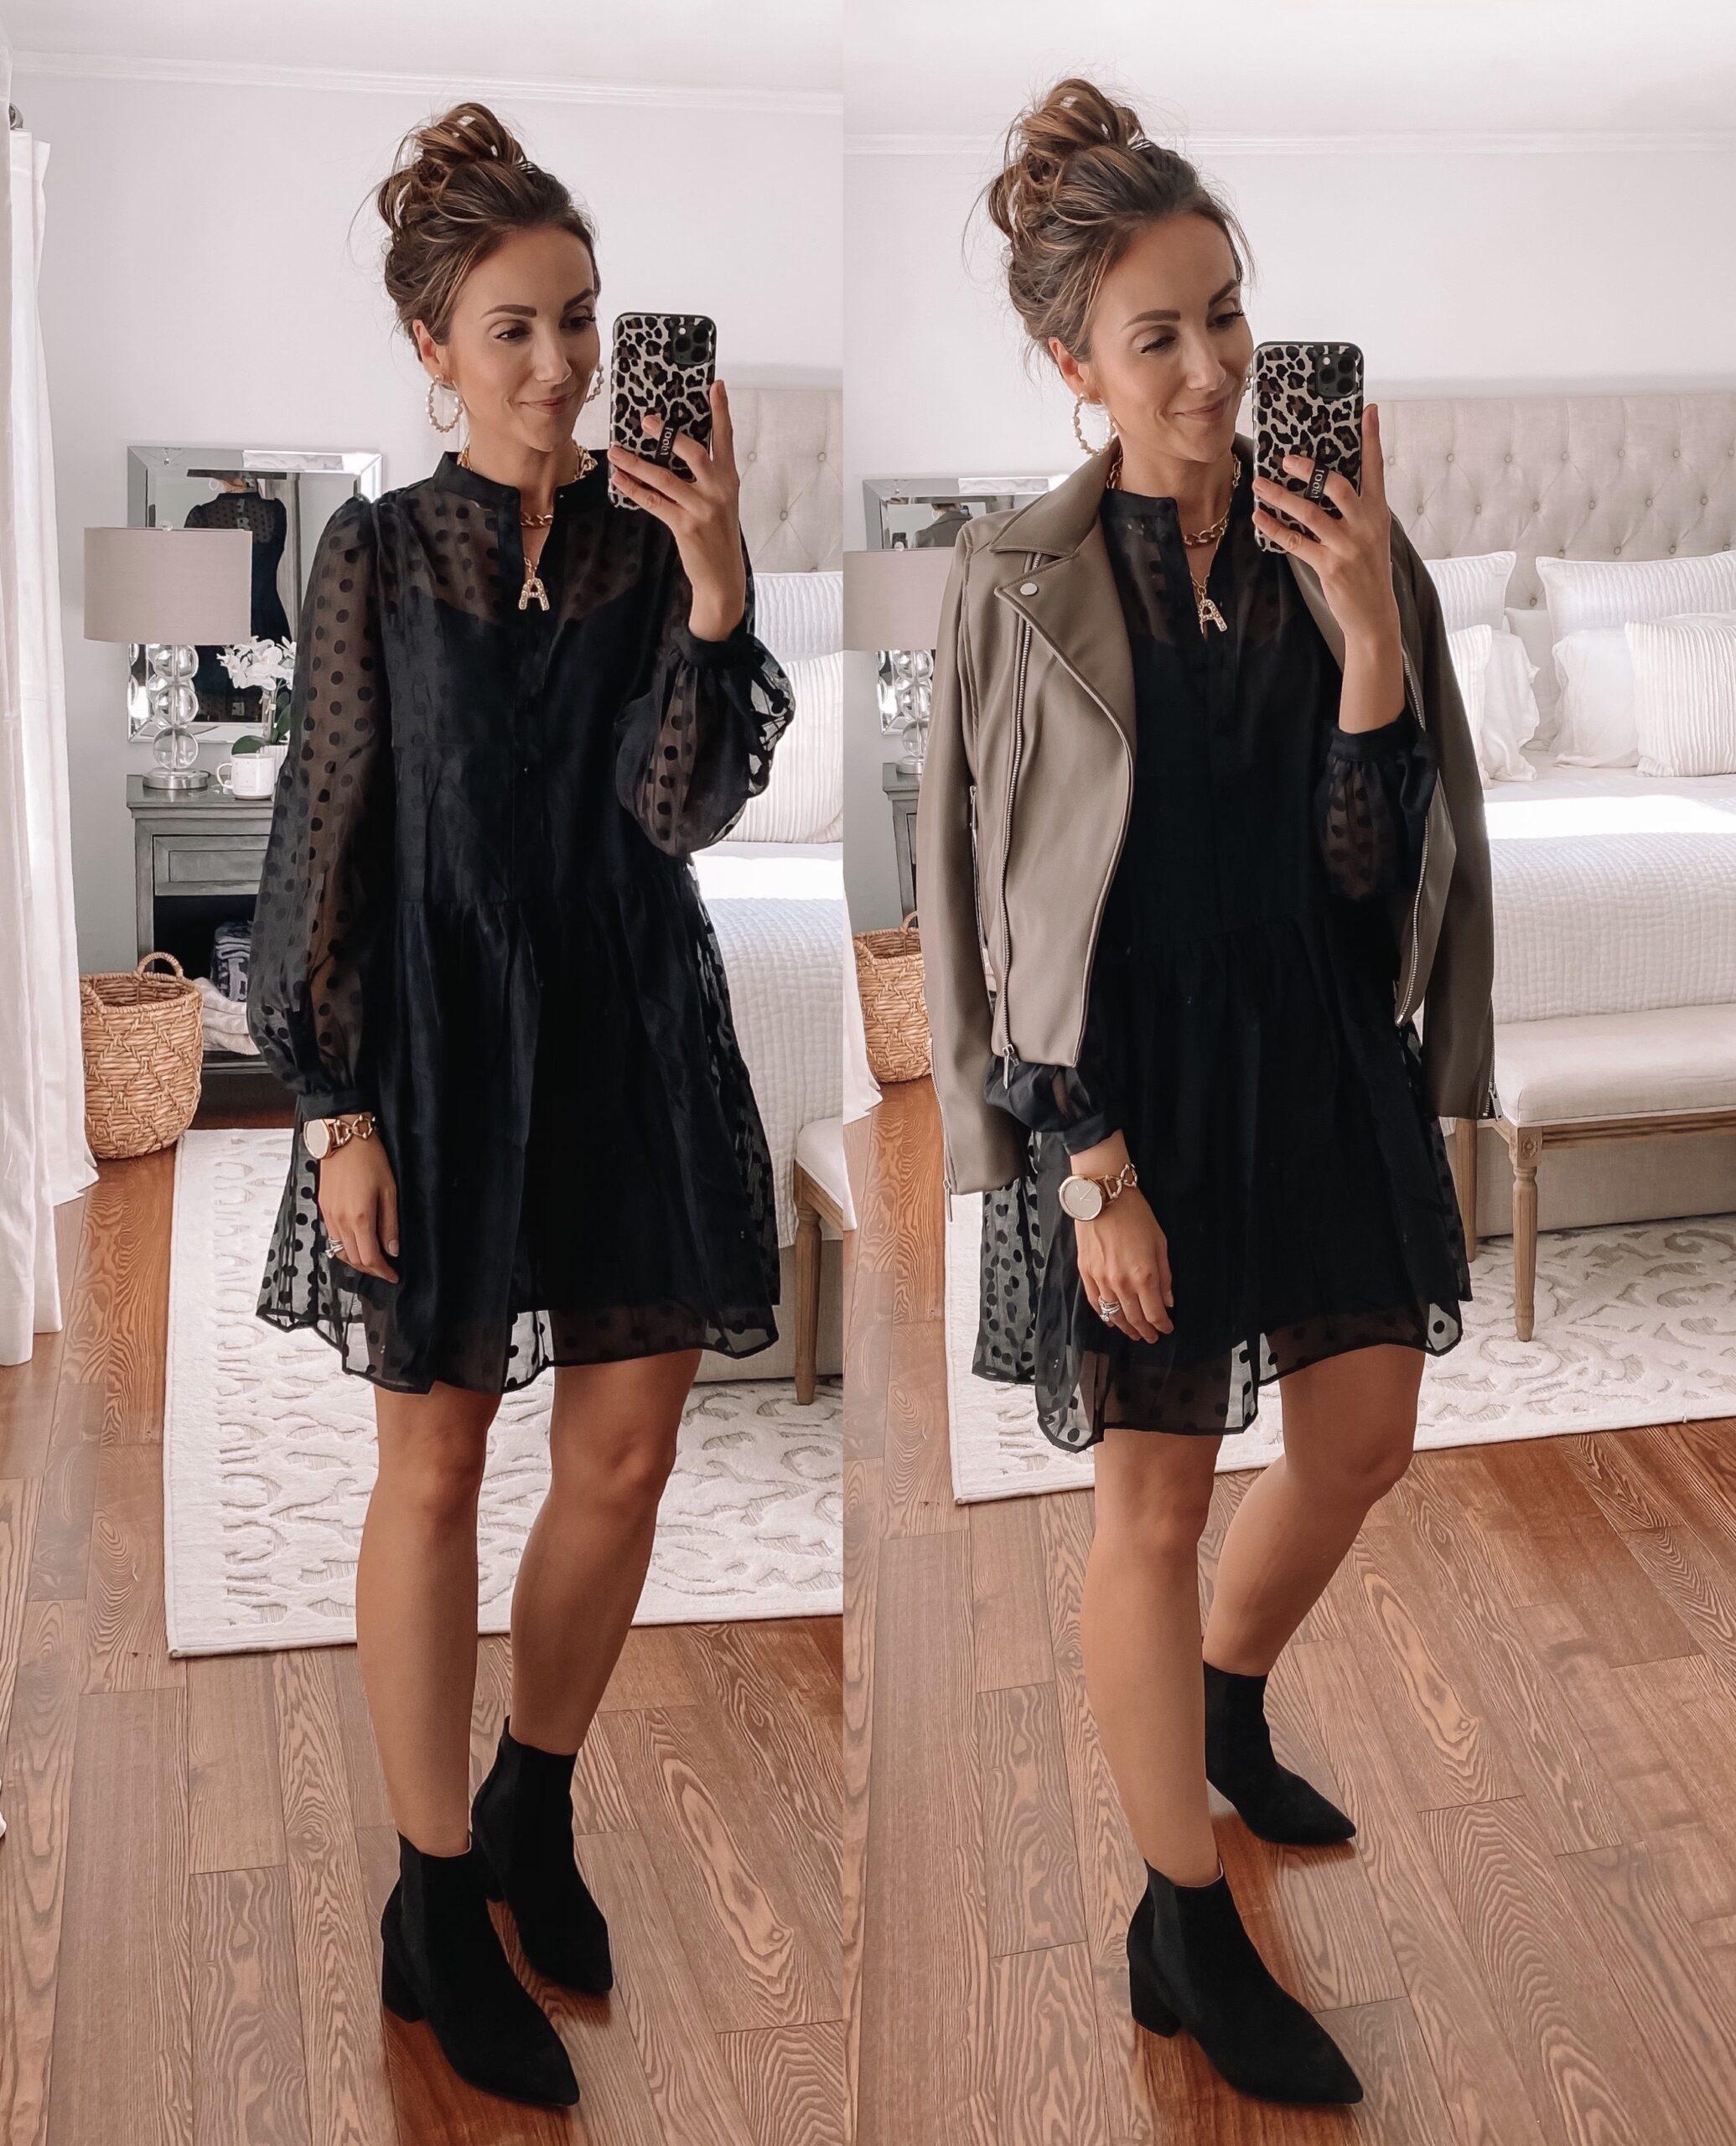 hm dress, faux leather jacket,black friday sale